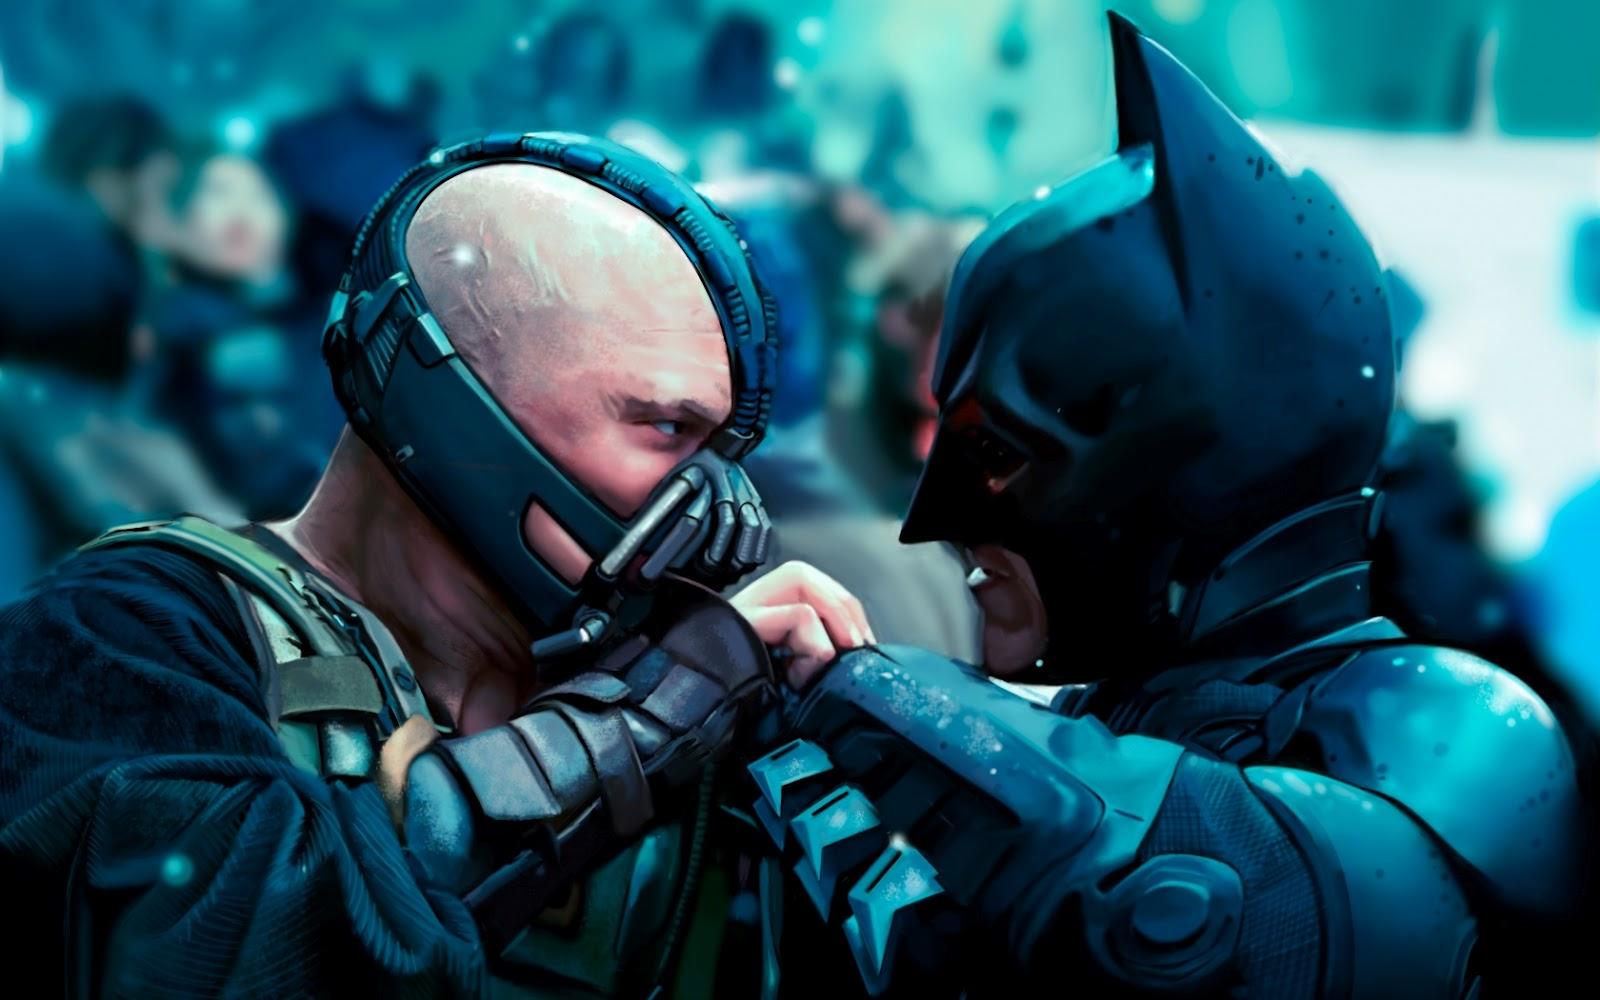 http://3.bp.blogspot.com/-cI6J7CmccSI/T8UH1_sspXI/AAAAAAAAB0M/GdDUiiMemeA/s1600/Batman_vs_Bane_Dark_Knight_Rises_HD_Wallpaper-Vvallpaper.Net.jpg